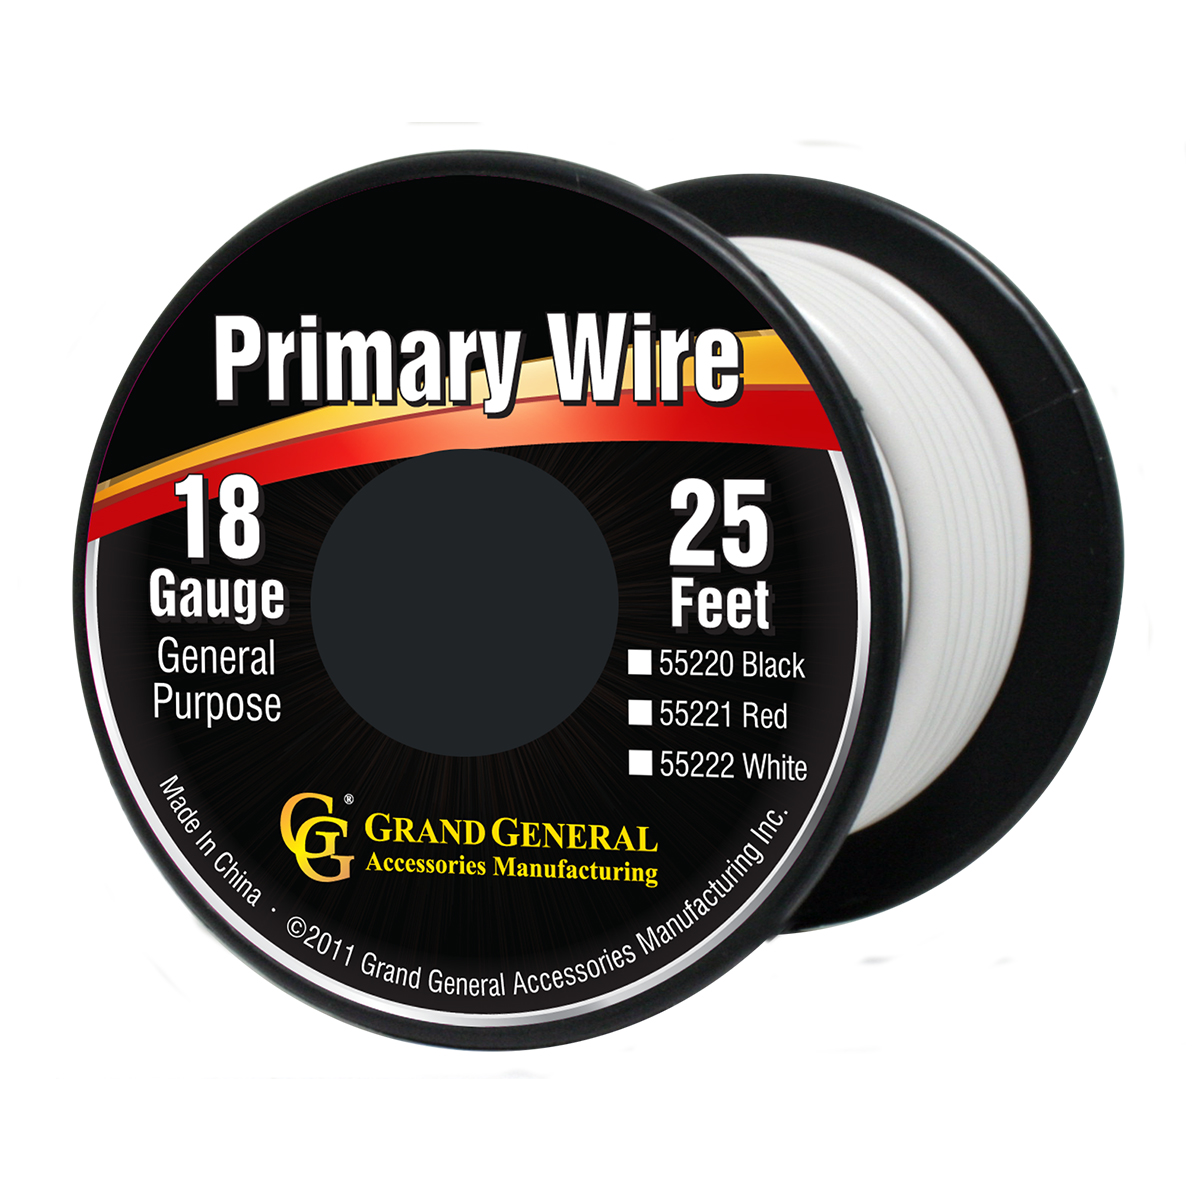 55222/55222SP Primary Wire in 18 Gauge, 25 Feet